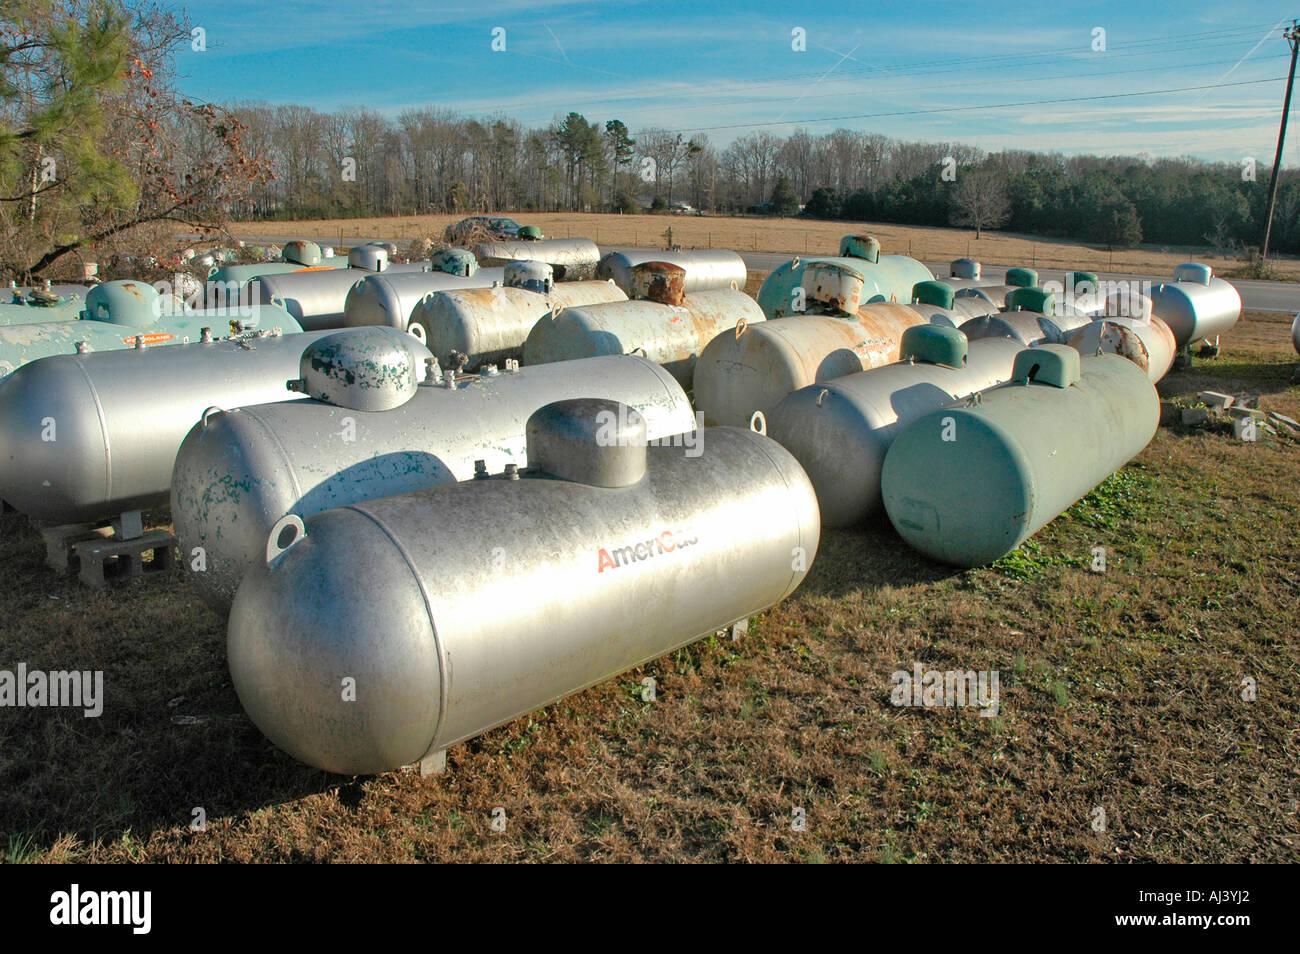 Underground Propane Tanks Stock Photos & Underground Propane Tanks